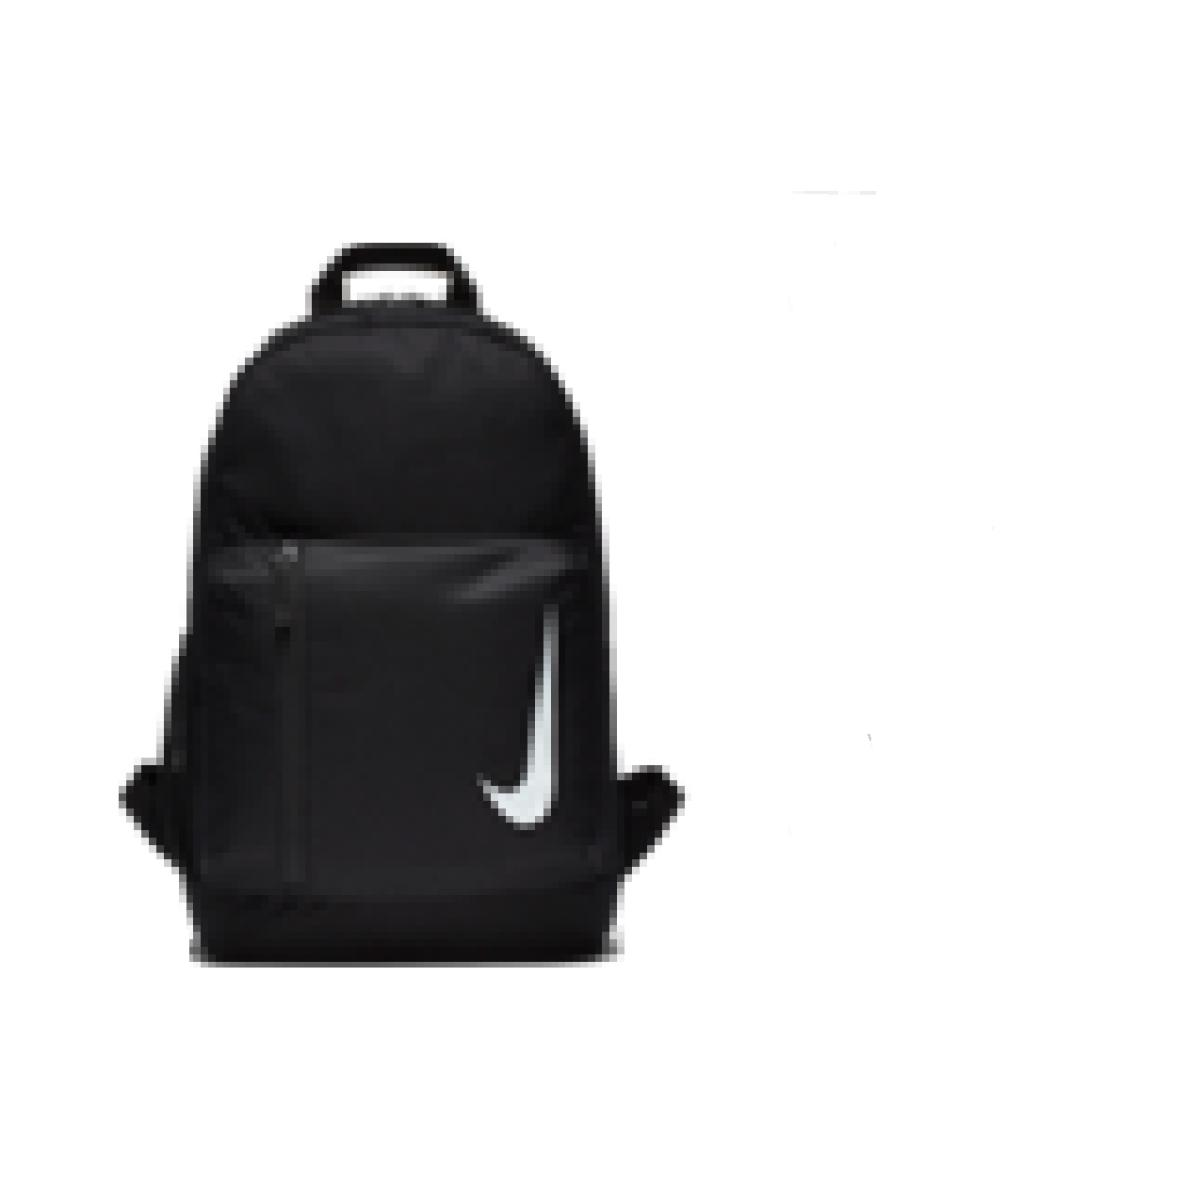 Mochila Unisex Nike Ba5773-010 Academy Team Preto/branco